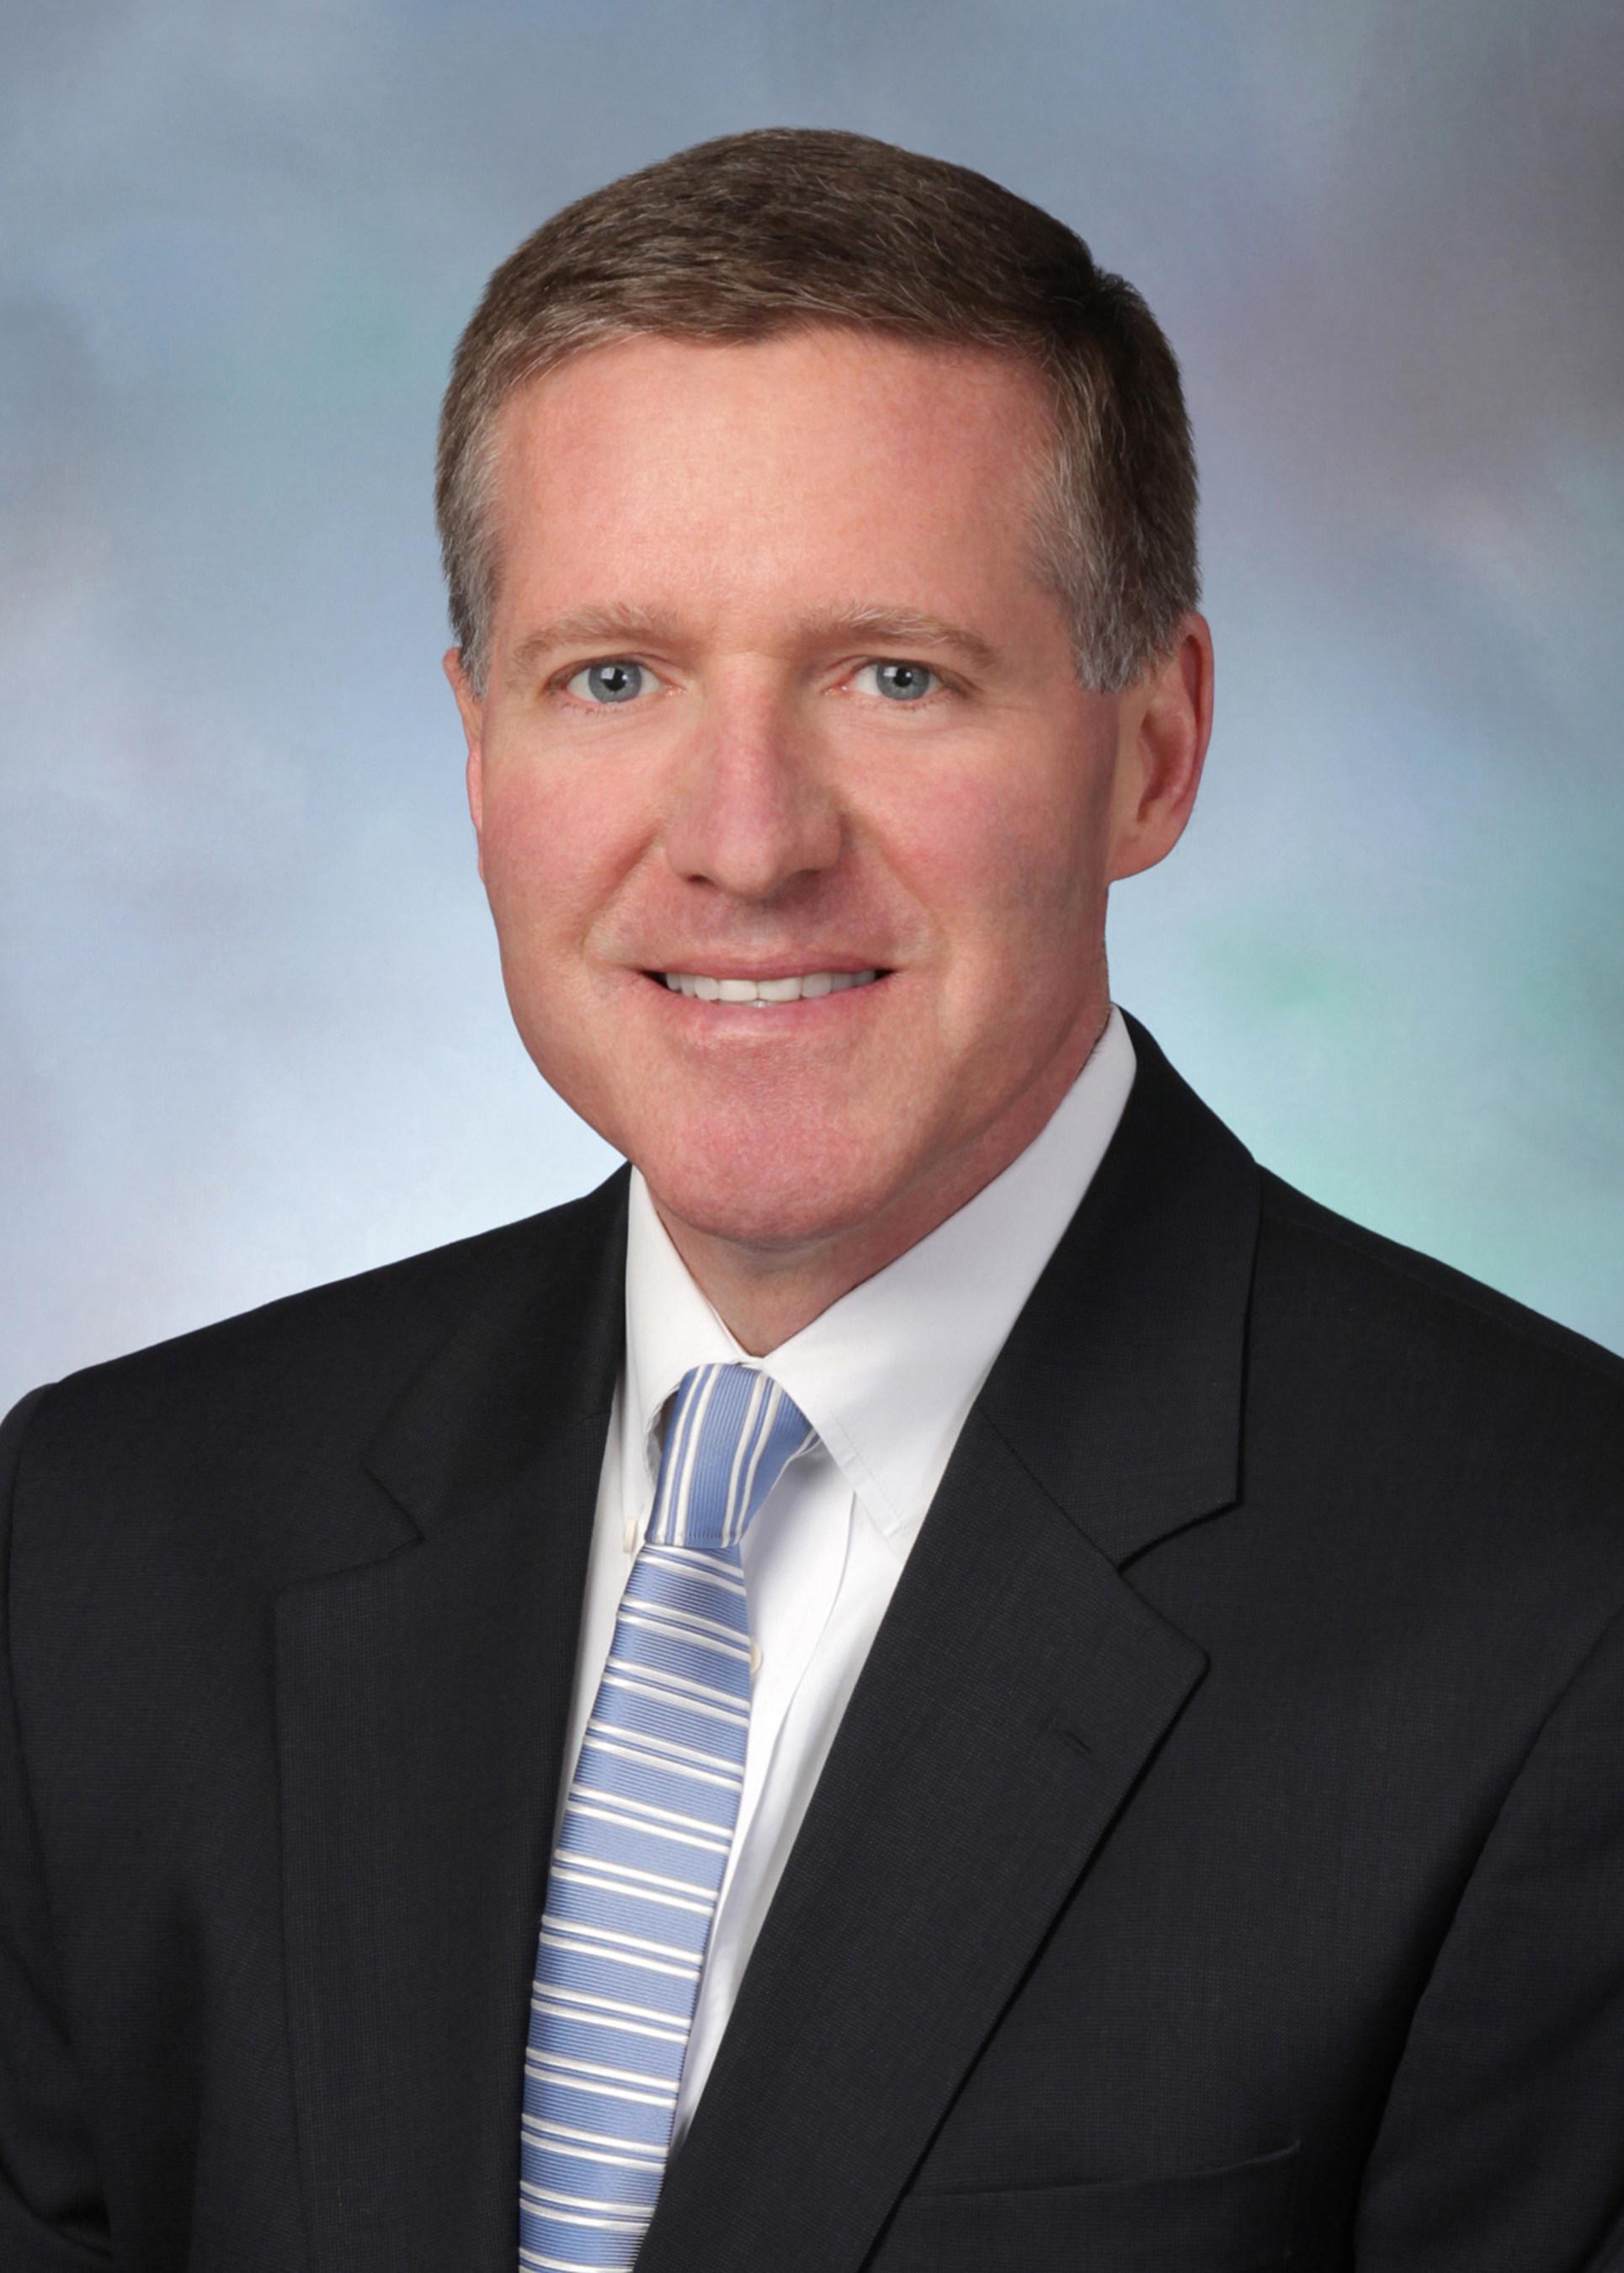 Kenneth L. Wainstein Named 2015 White Collar Crime Trailblazer By National Law Journal